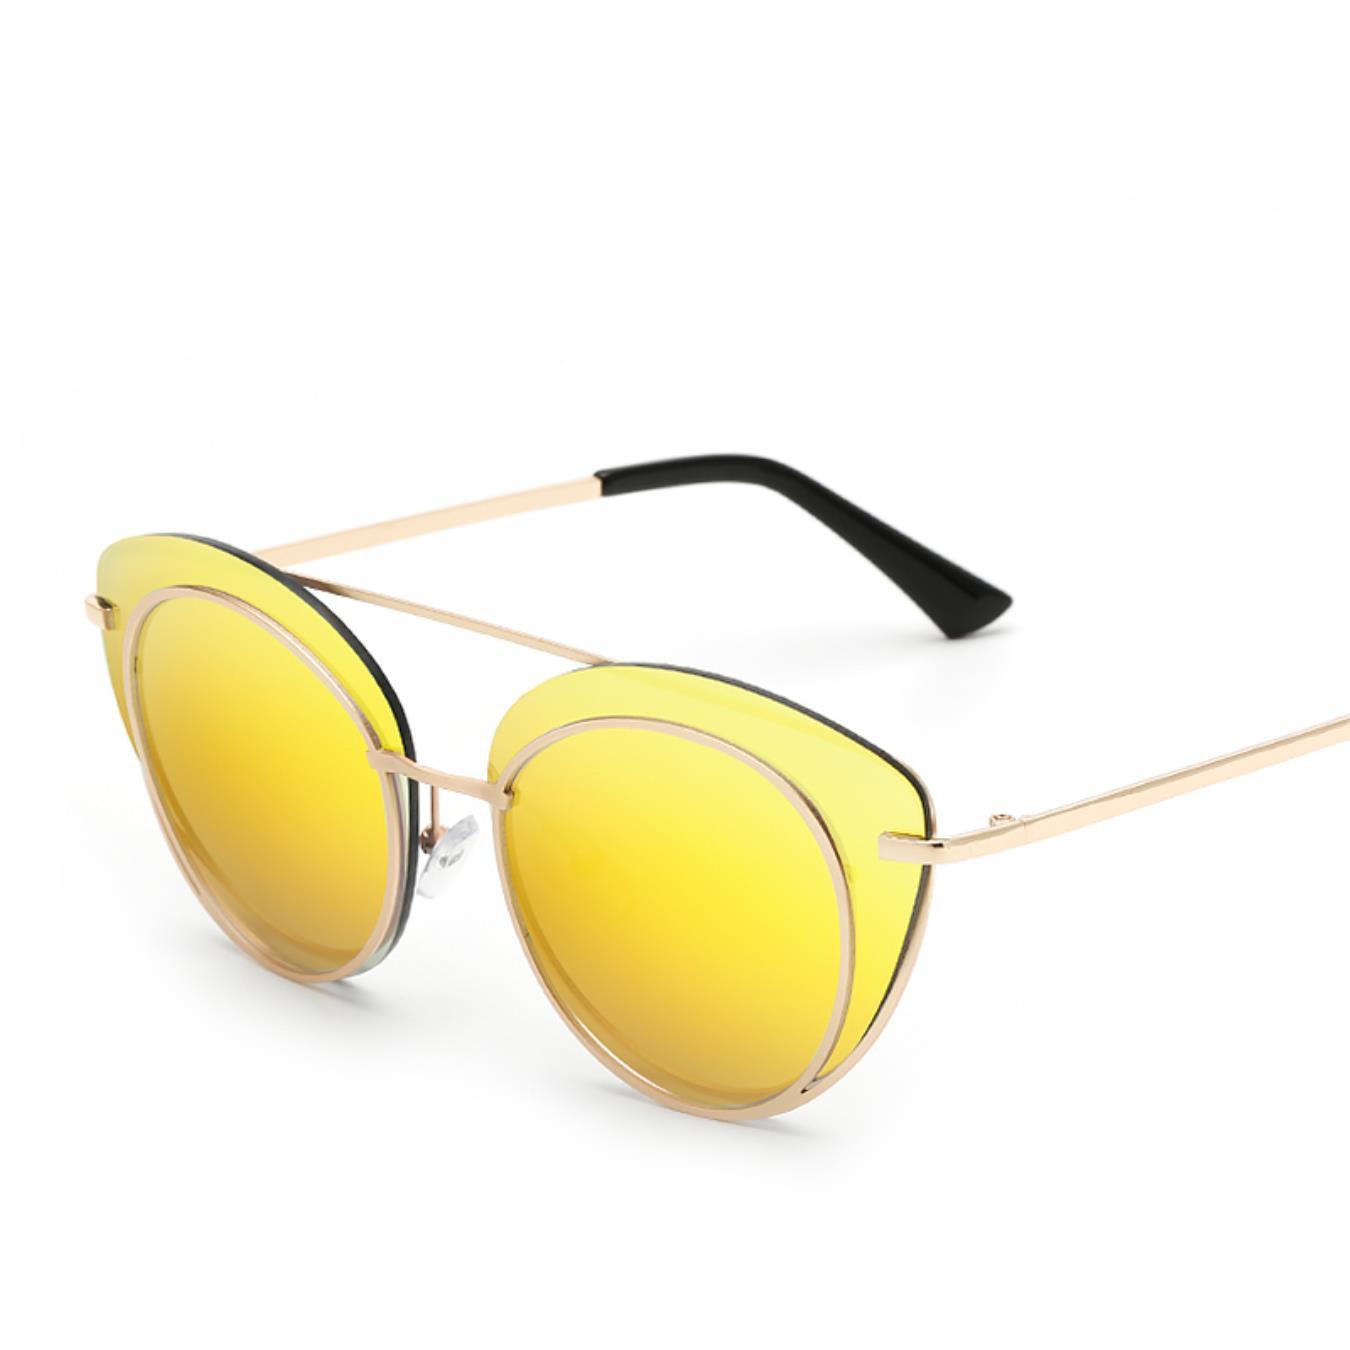 840864c5be943 Women Anti-Reflective Sunglasses Fashion Retro Metal Frame Glasses Uv 400  Wholesale Sunglases at Amazon Men s Clothing store